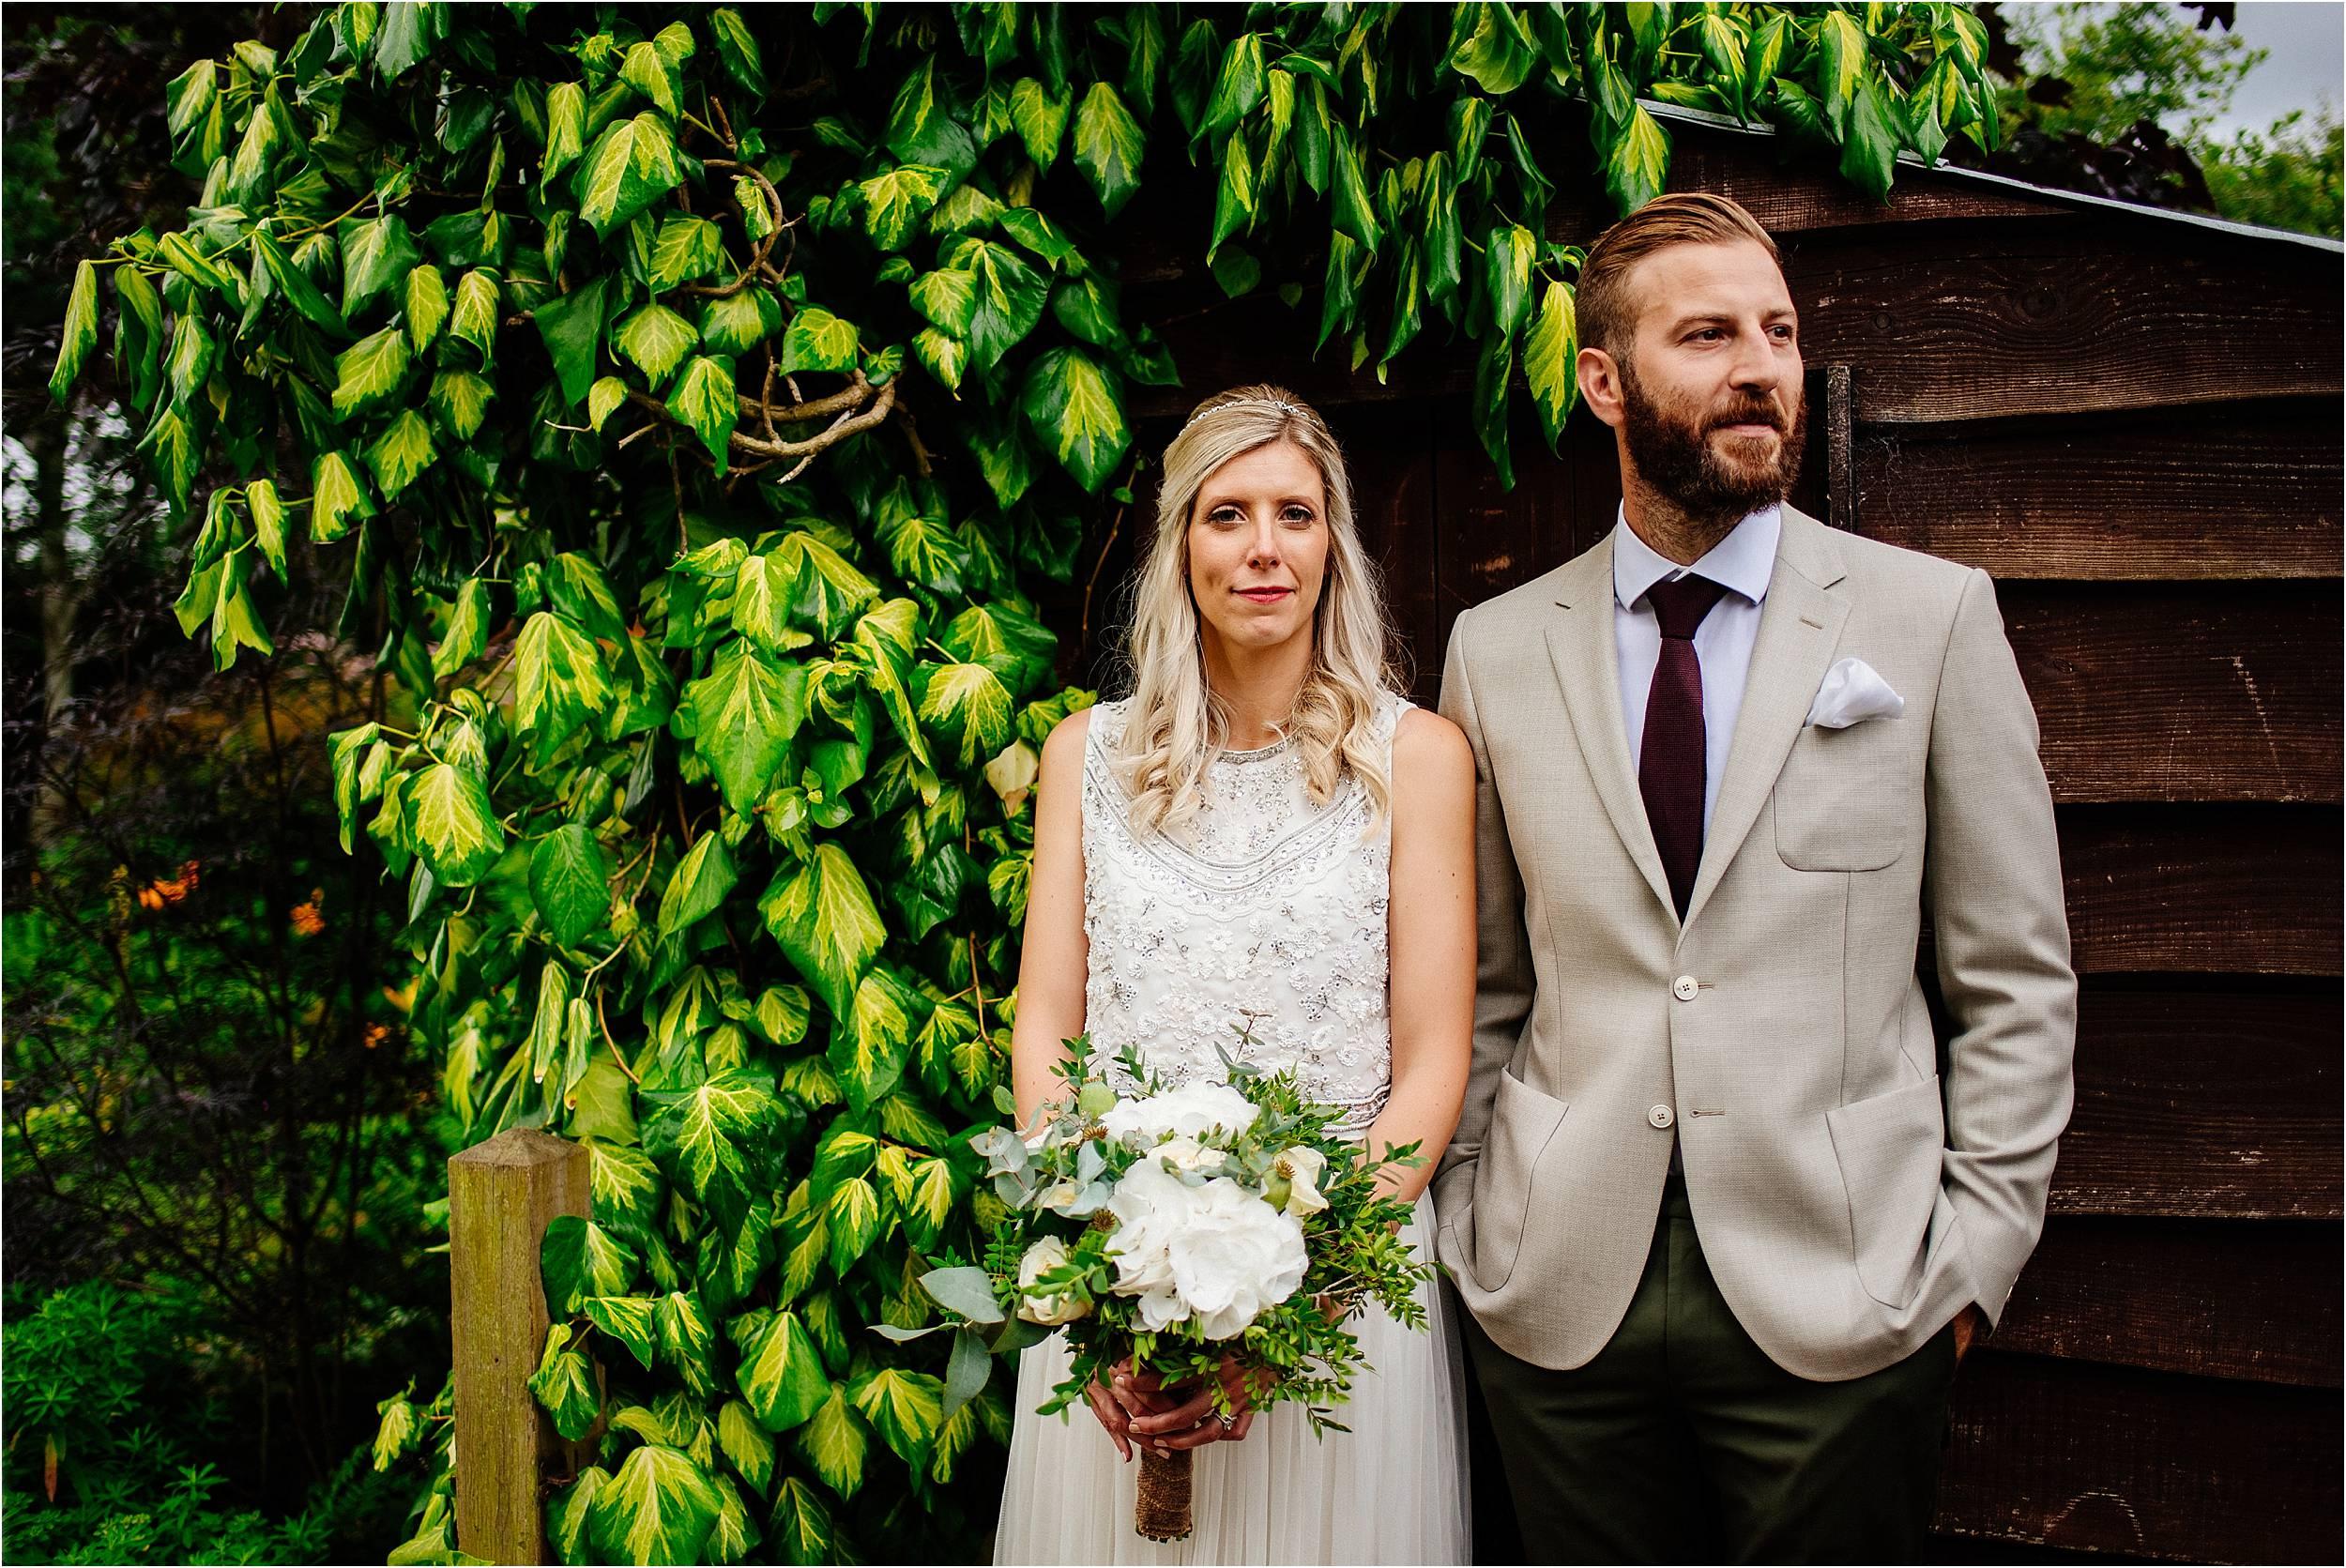 Barnsdale Gardens Wedding Photographer_0068.jpg